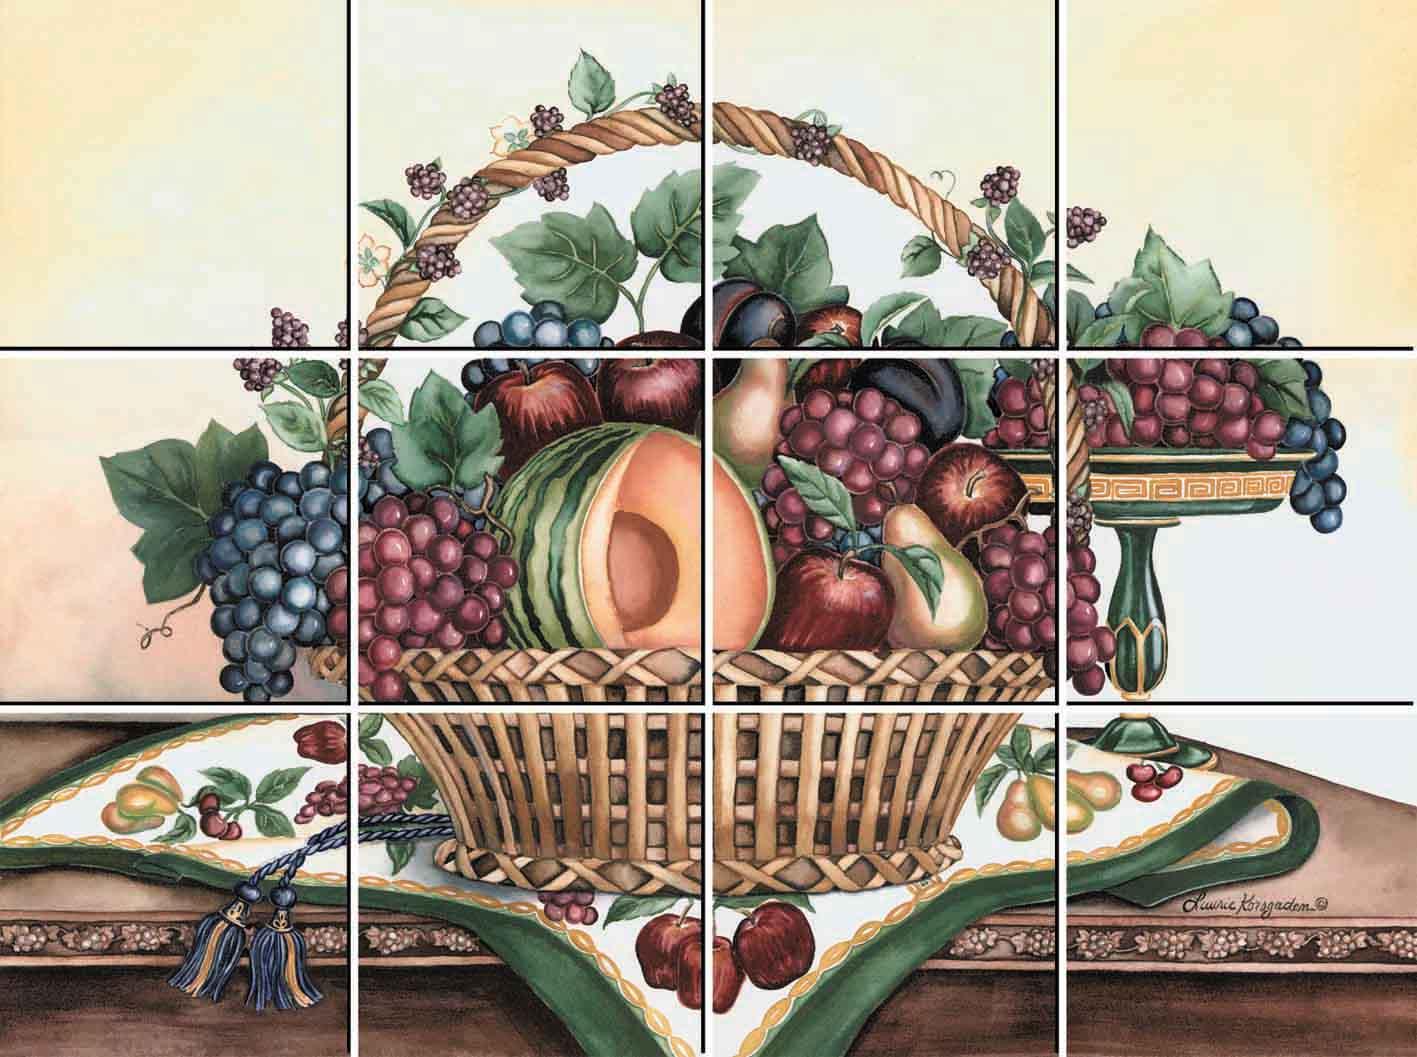 IdeaStix Fruit Basket 12-Piece Tile Mural - Original Premium Peel and Stick Décor